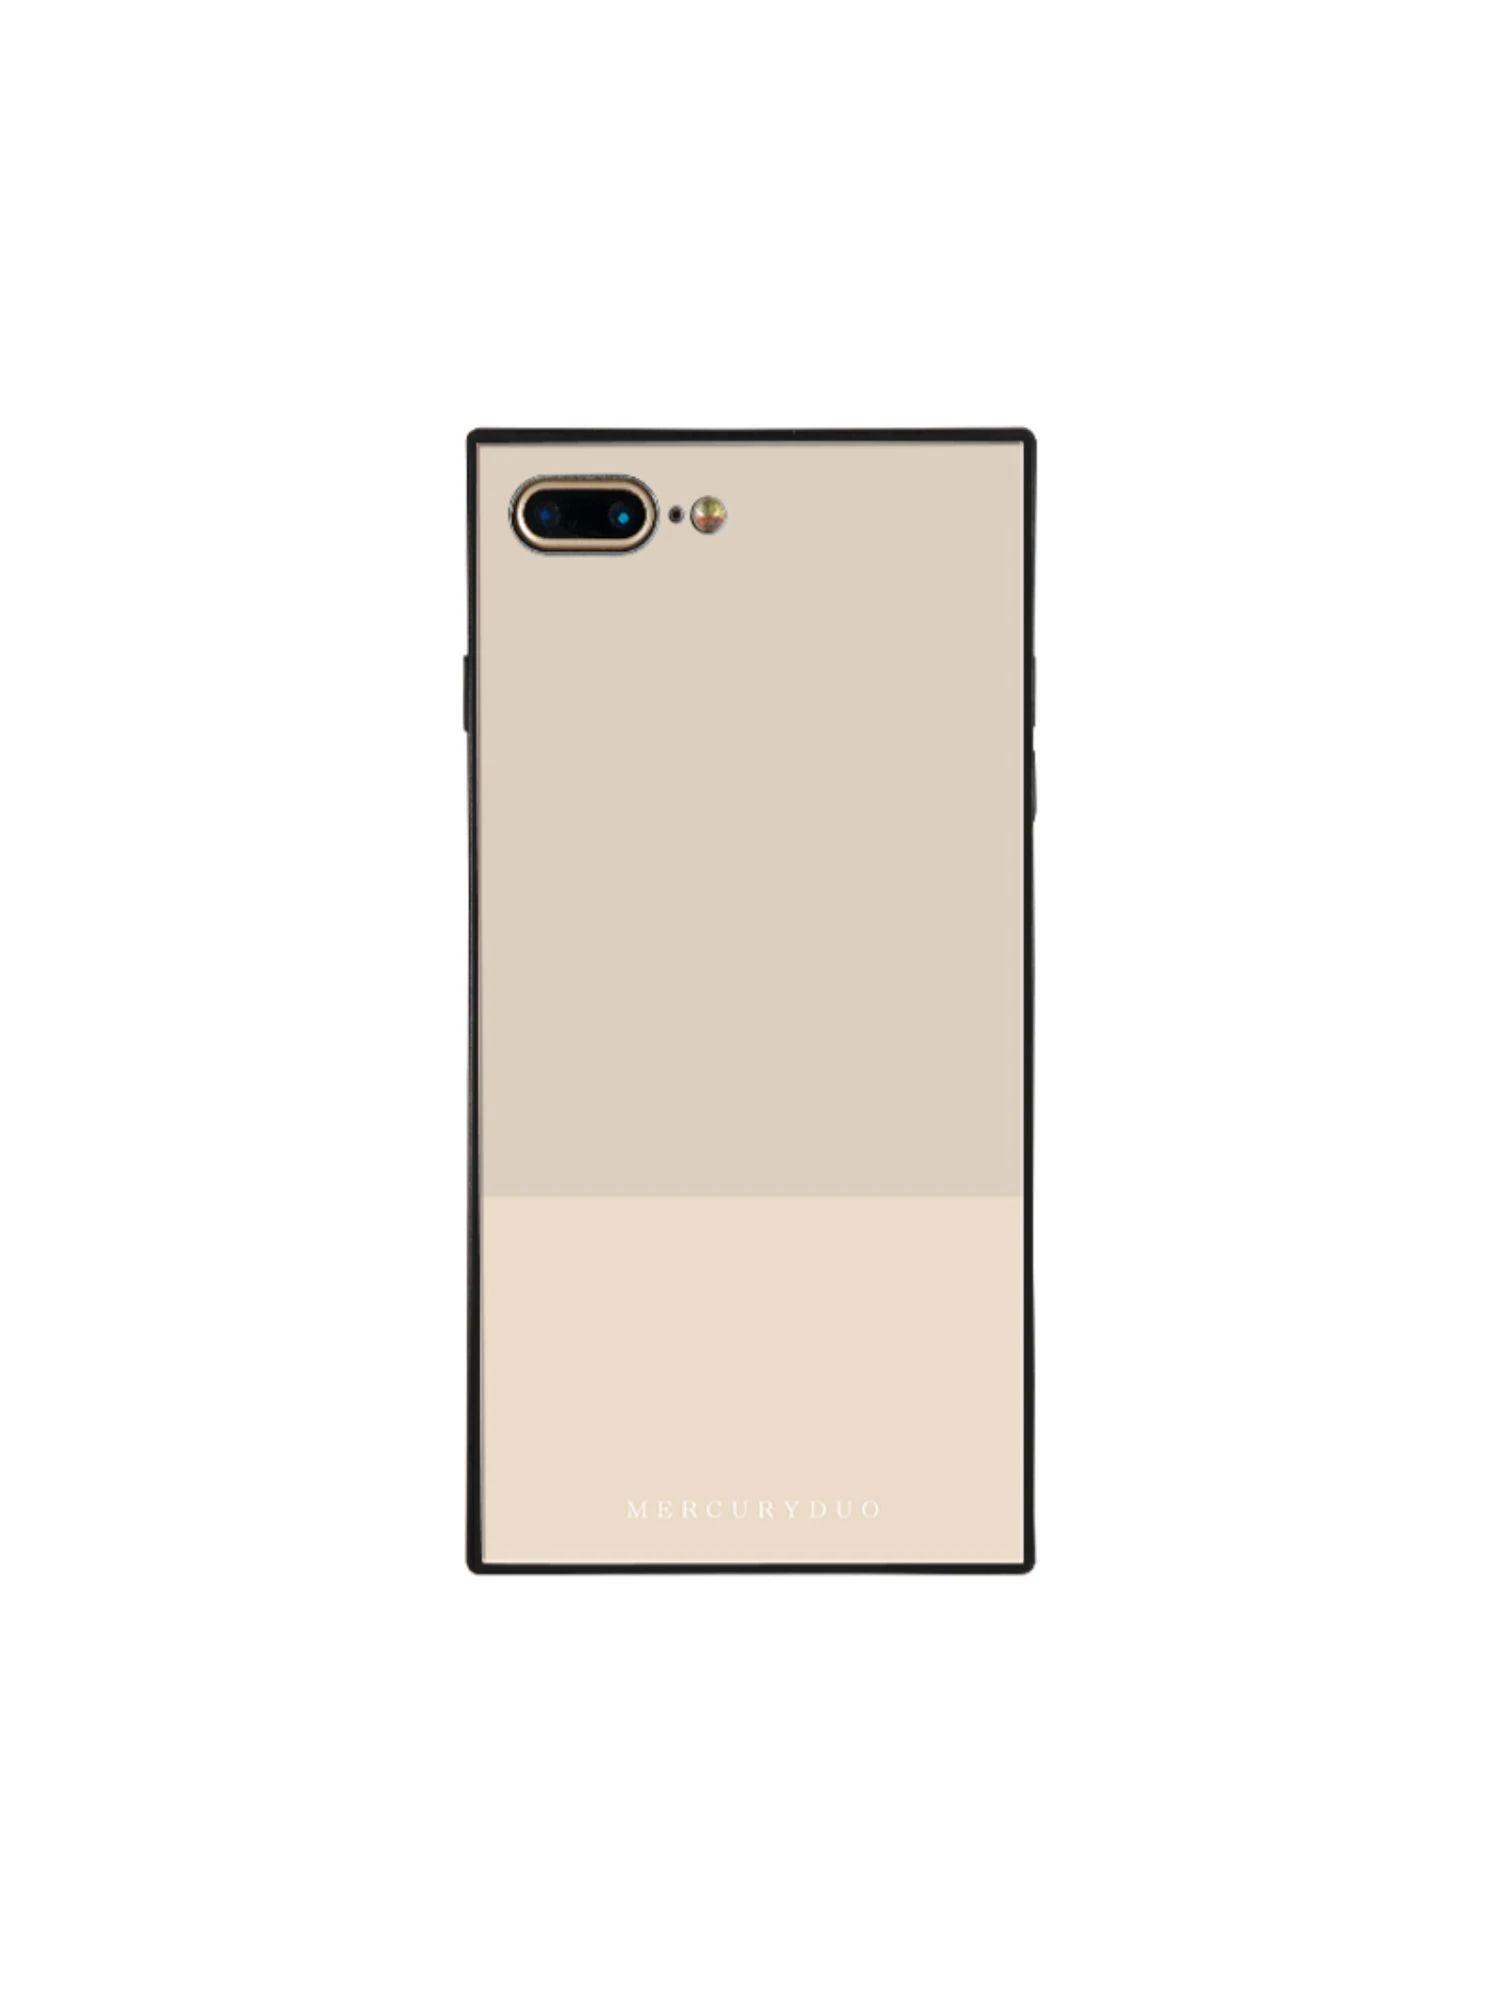 【MERCURYDUO】バイカラー iphone-7/8Plus スマホケース